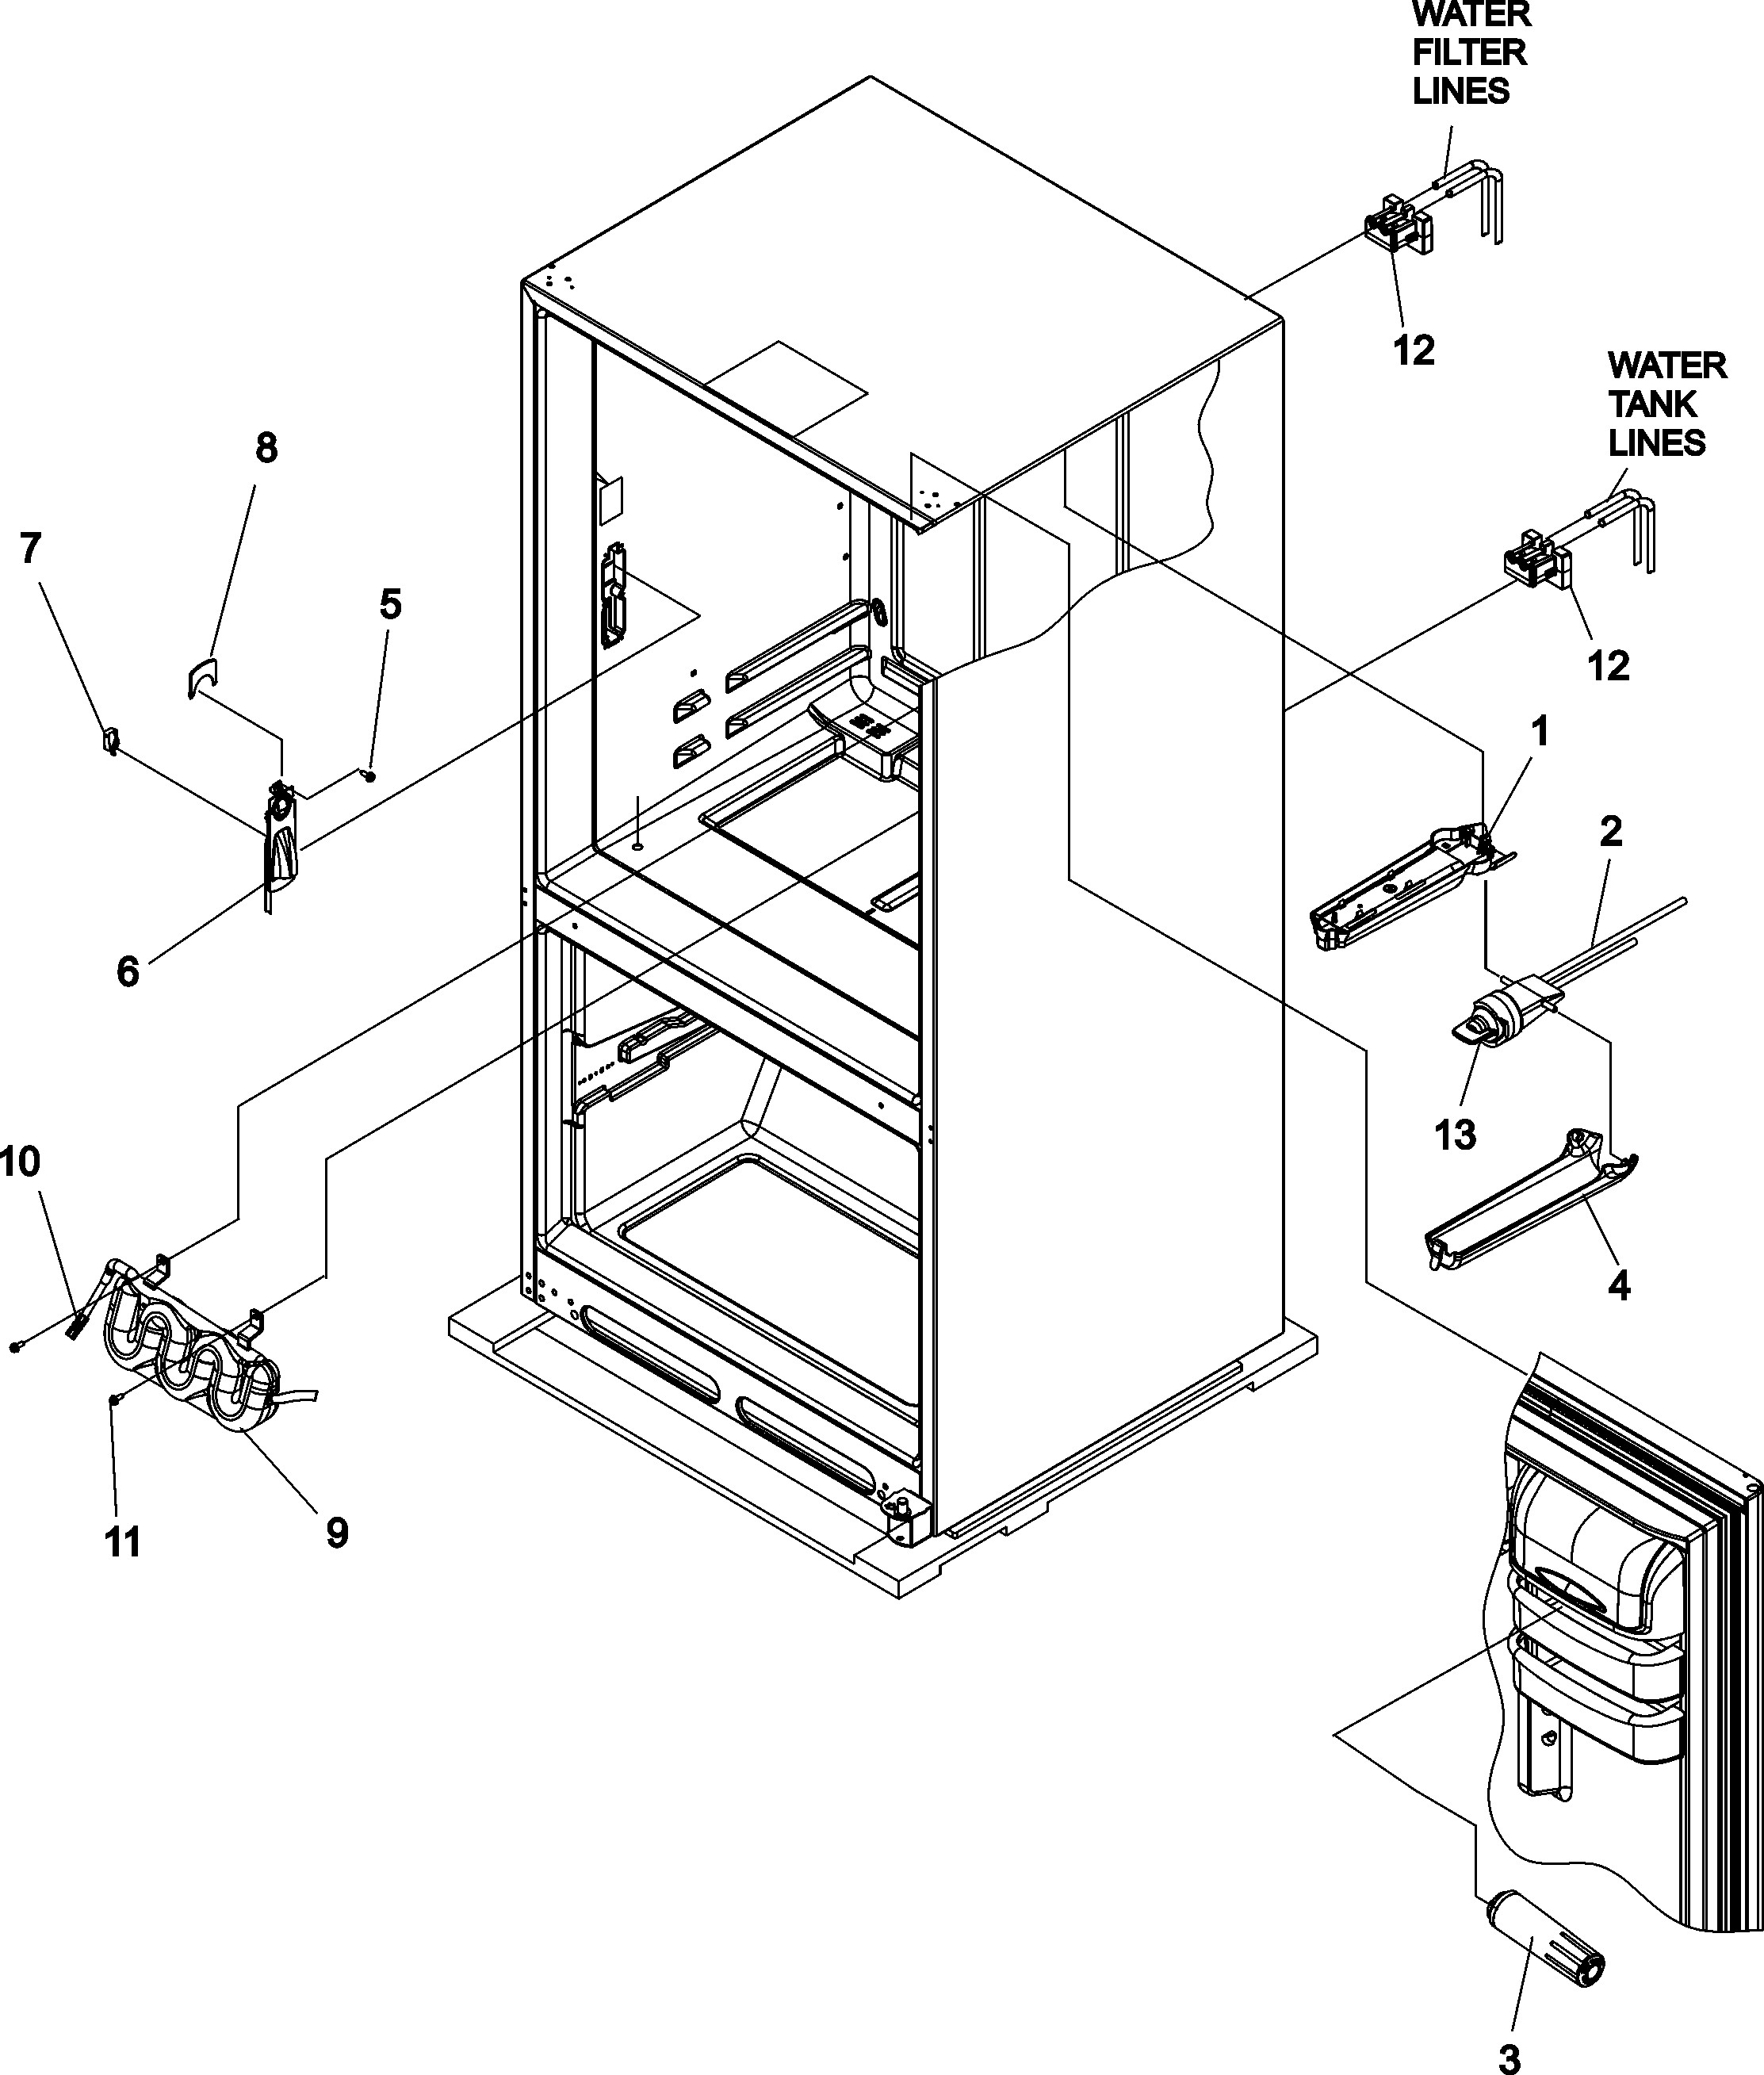 Ge Monogram Refrigerator Parts Diagram Kenmore Elite Model Bottom Mount Refrigerator Genuine Parts Of Ge Monogram Refrigerator Parts Diagram